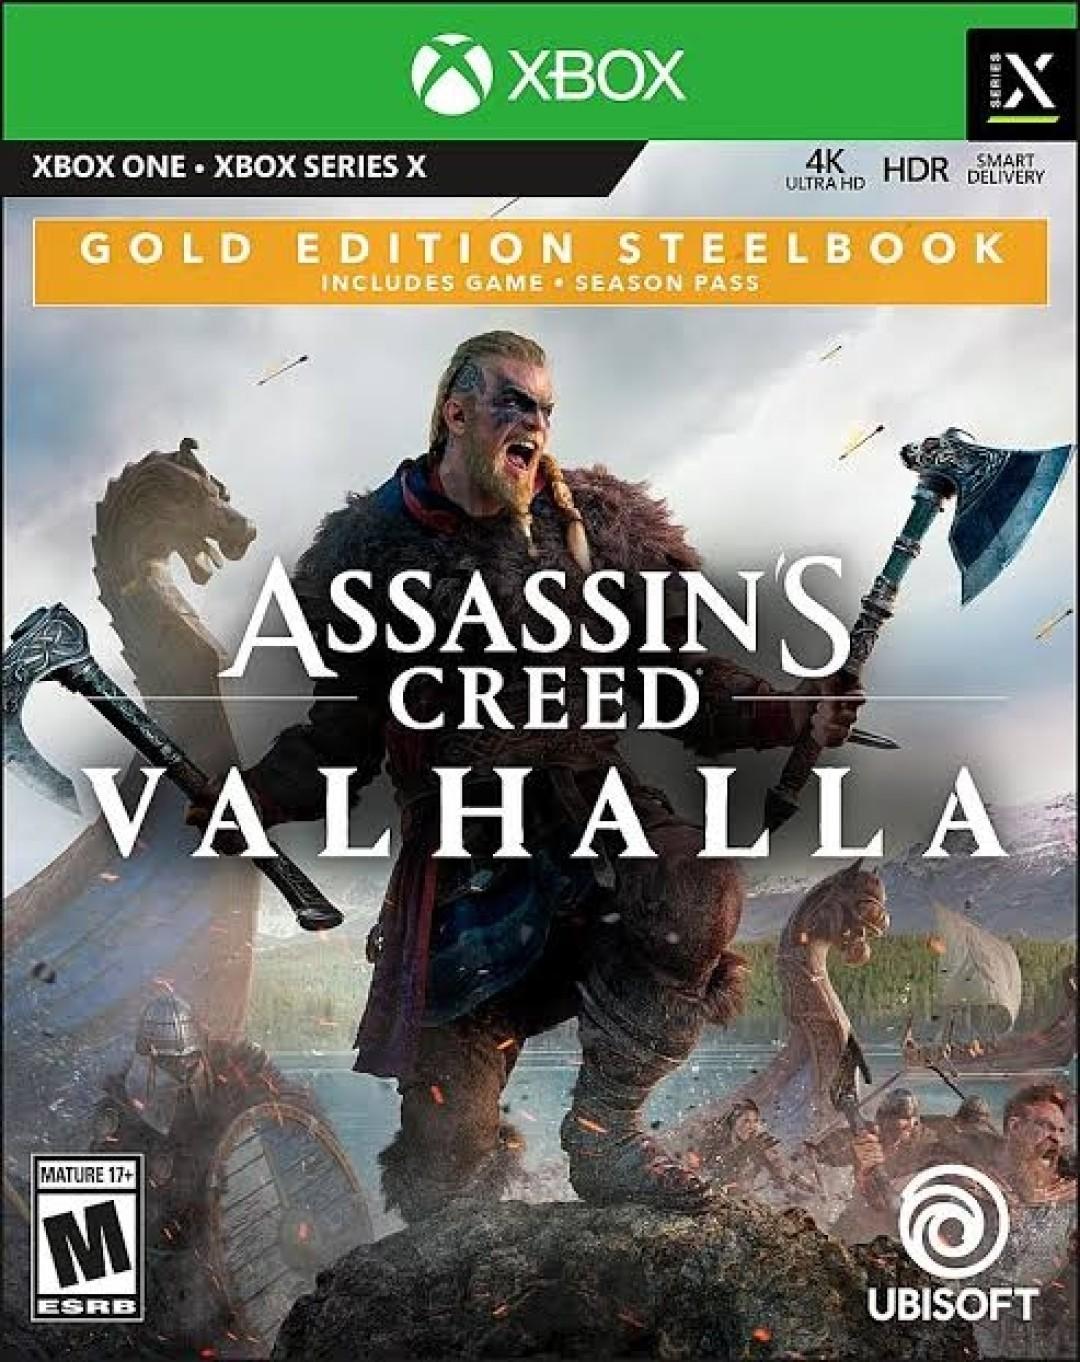 Assassin's Creed: Valhalla - Gold Edition Steelbook